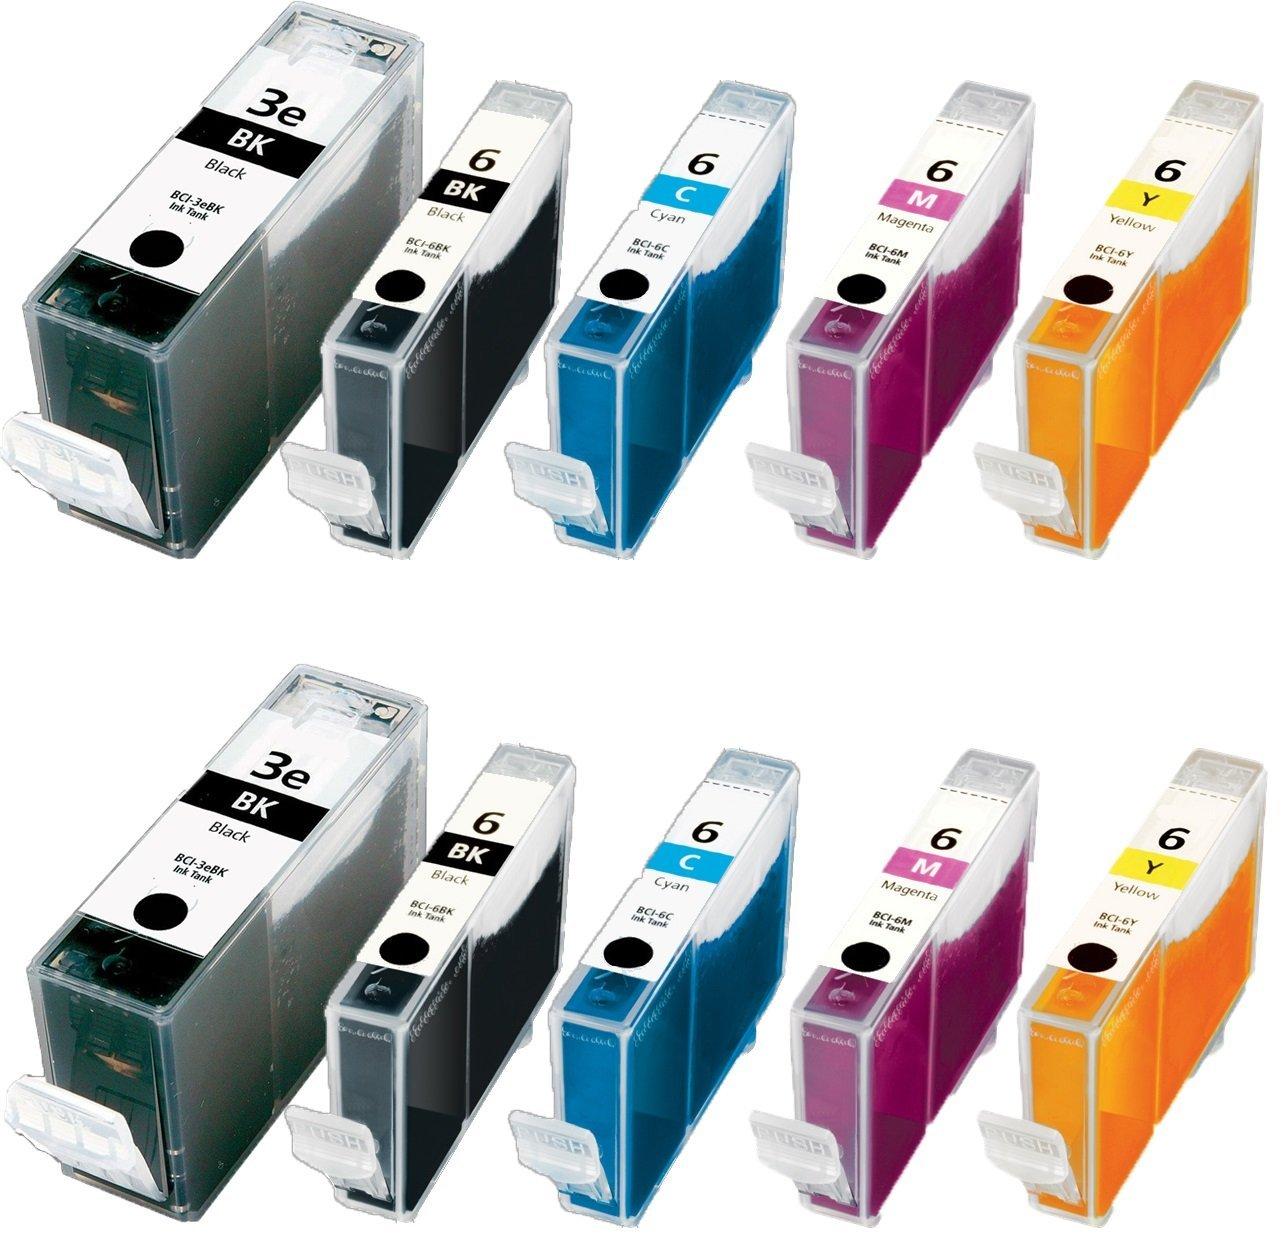 10/Pack BCI 3e BCI 6 2B/2B/2C/2M/2Y Combo ink cartridges Canon Cartridges Compatible with: PIXMA iP5000 i860 i865 Photo PIXMA MP750 MP760 MP780 iP3000